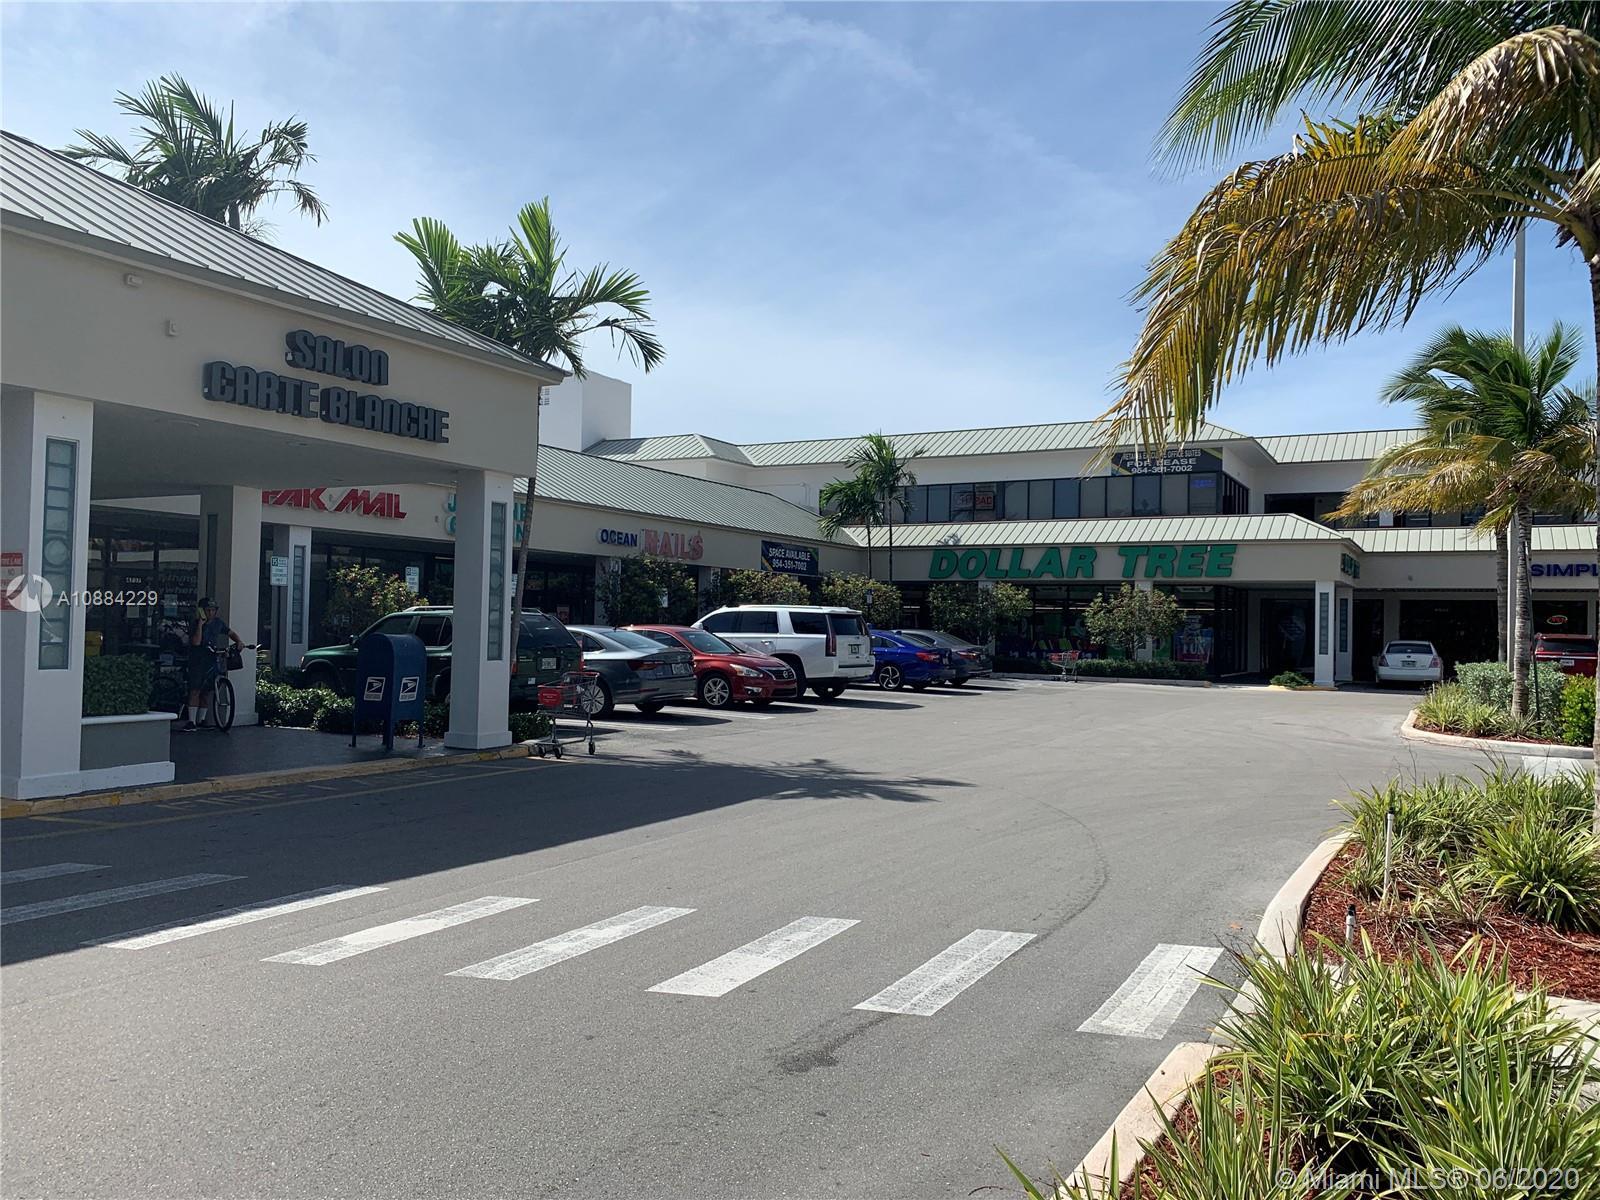 Photo - 4735 N Ocean Blvd, Lauderdale By The Sea FL 33308